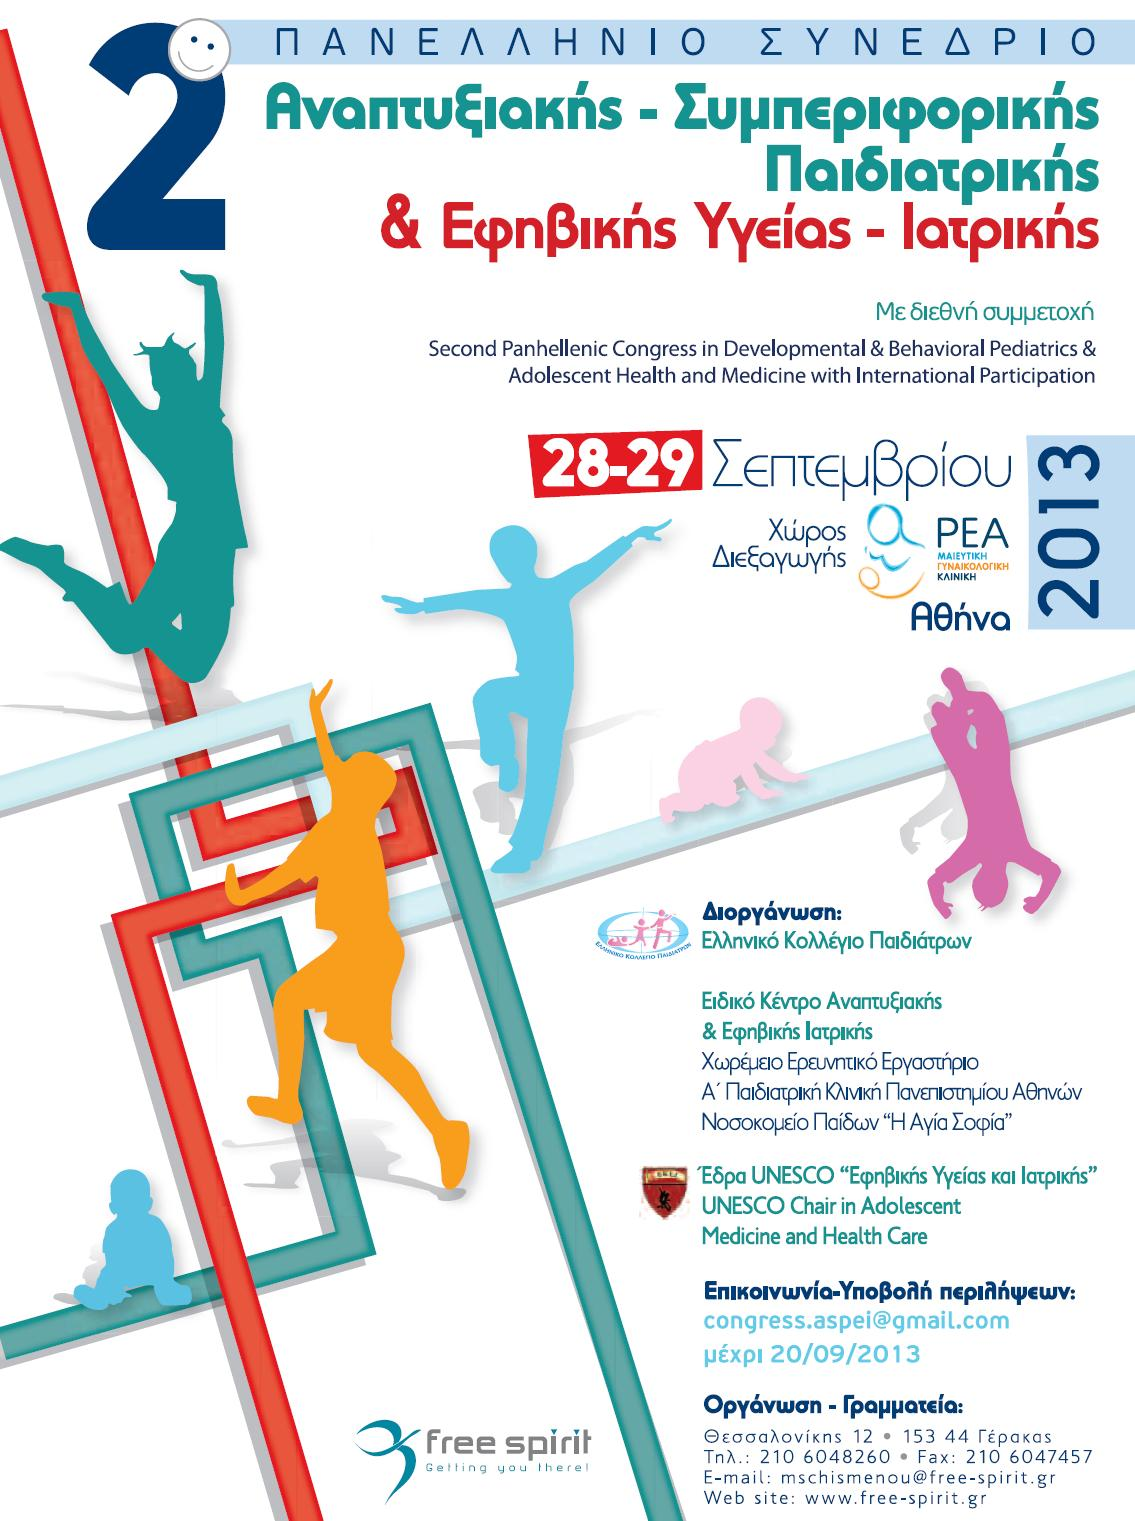 2o Πανελλήνιο Συνέδριο Αναπτυξιακής - Συμπεριφορικής Παιδιατρικής & Εφηβικής Υγείας - Ιατρικής